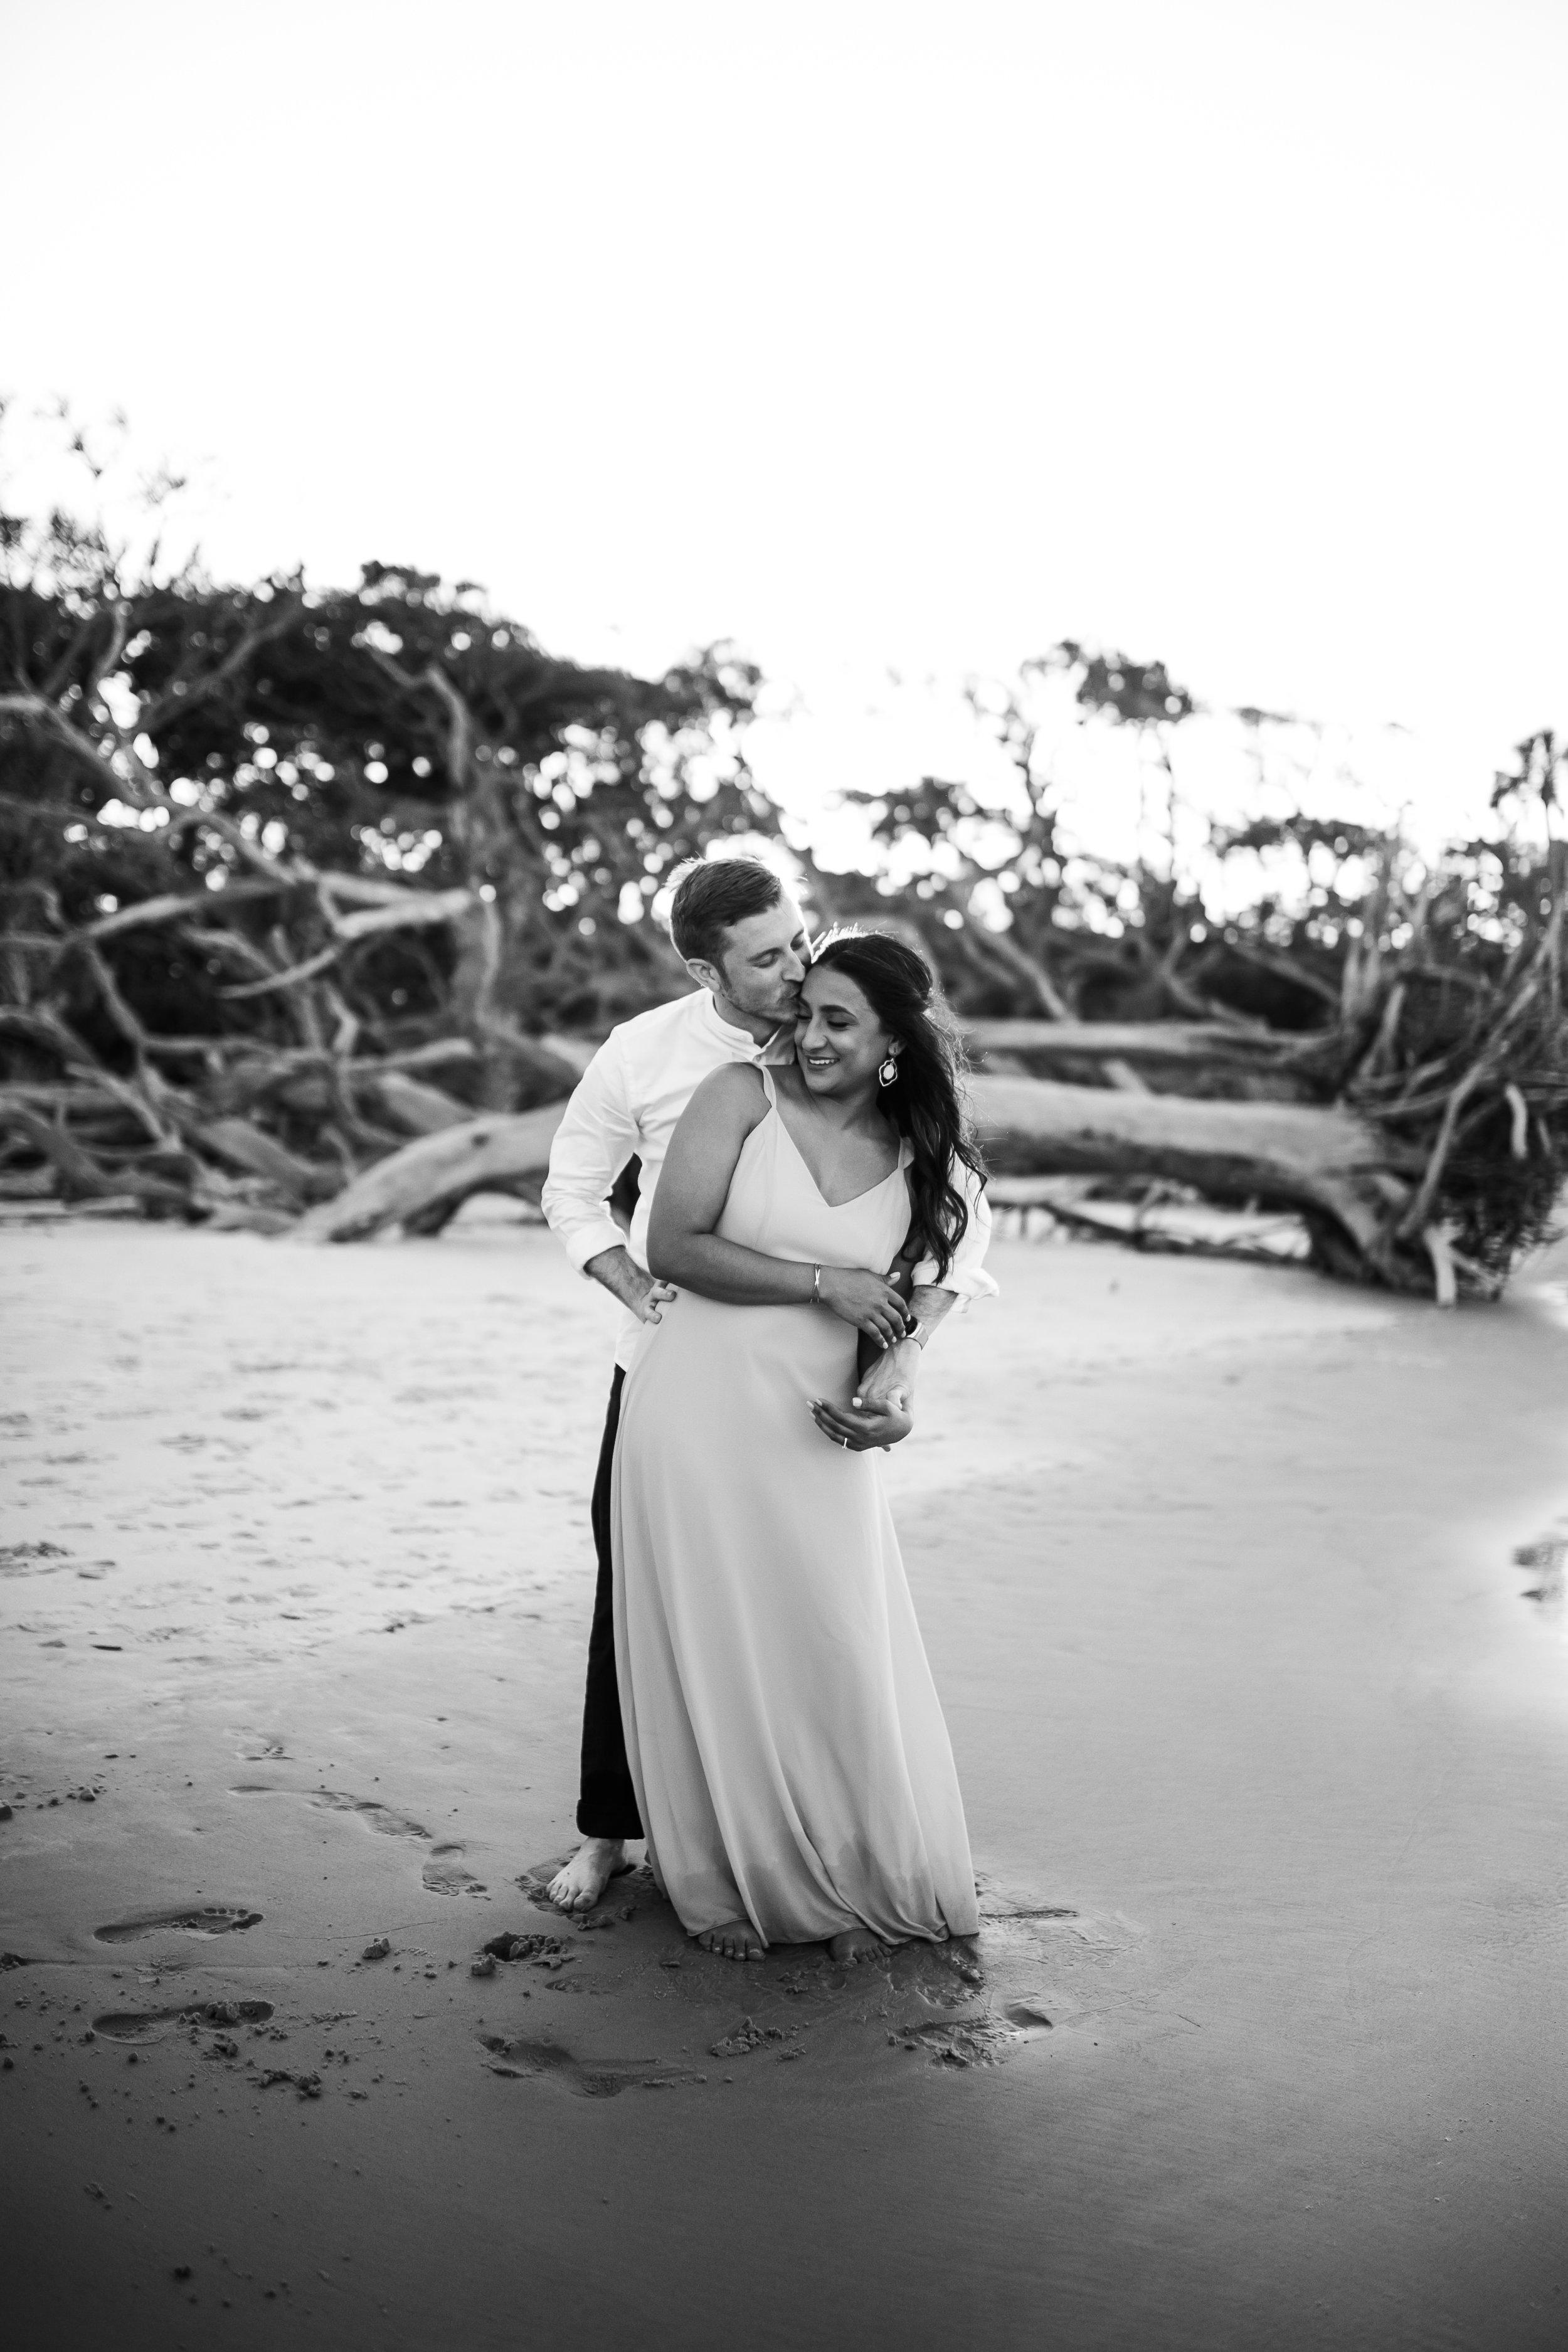 driftwood-beach-Jacksonville-Florida-engagement-photographer